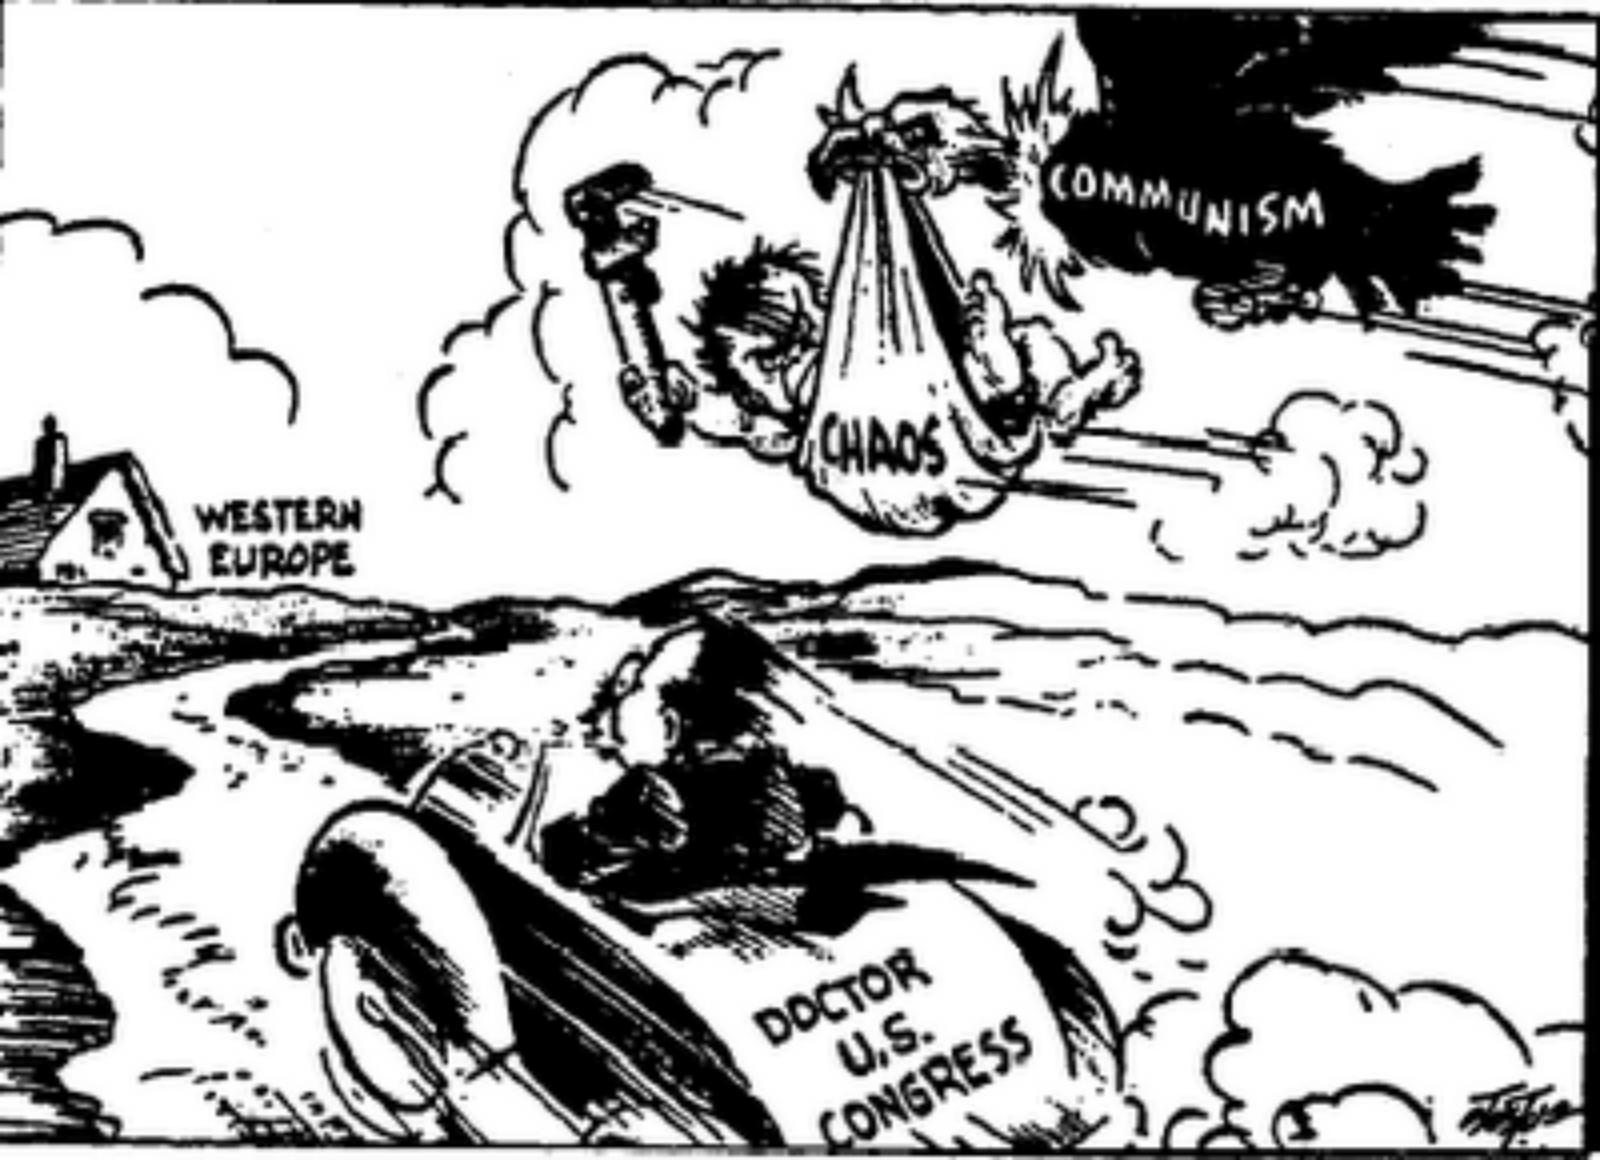 communist cartoon of ww2